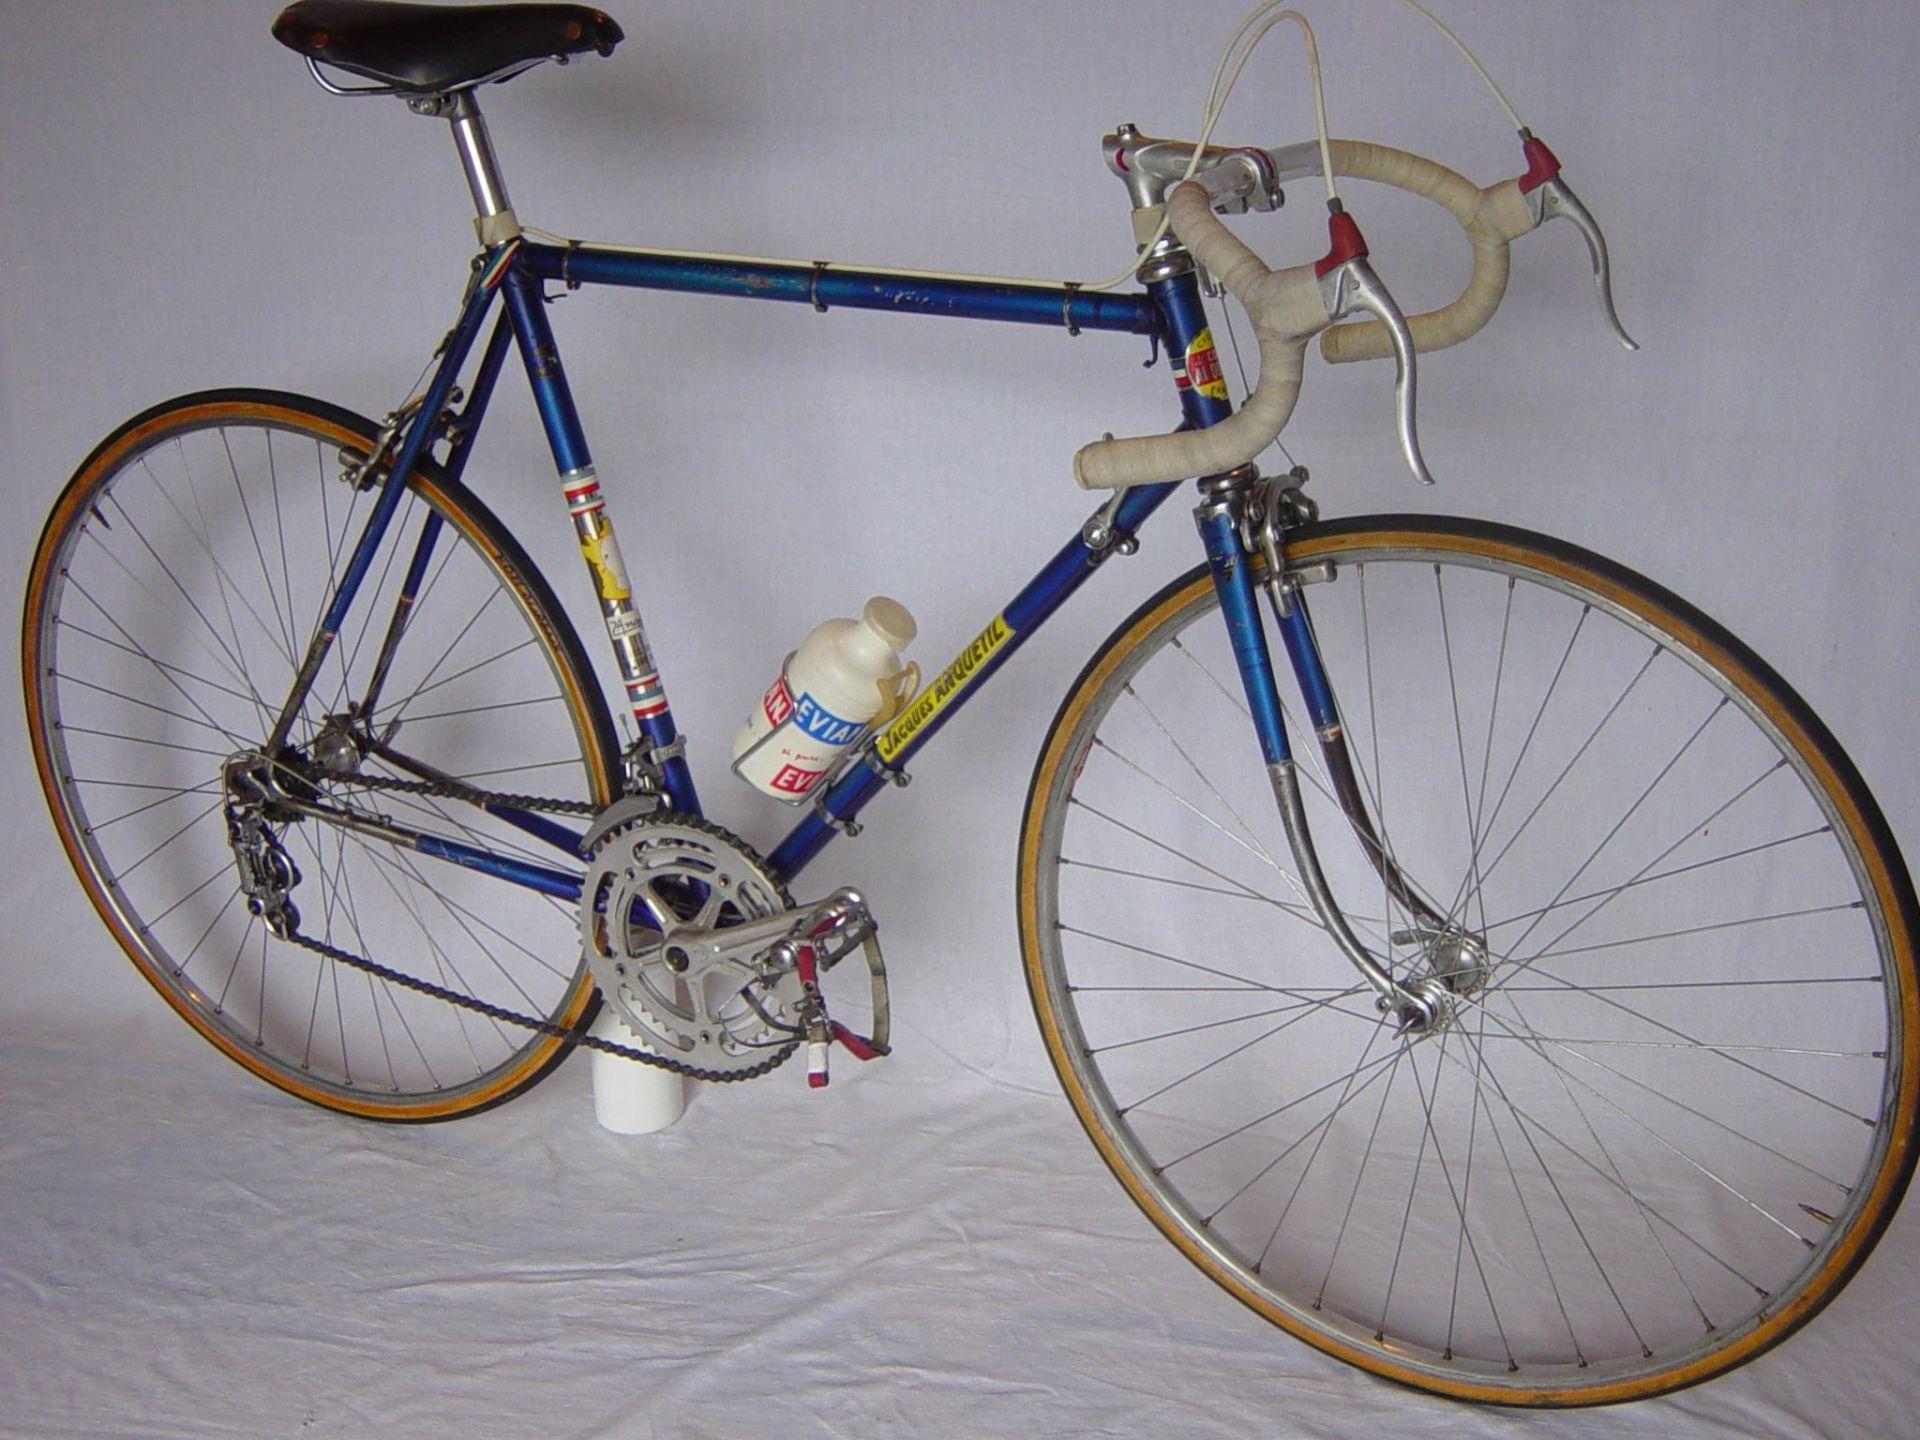 peinture - Anquetil 1965 - Page 2 752453Rvlotermin3